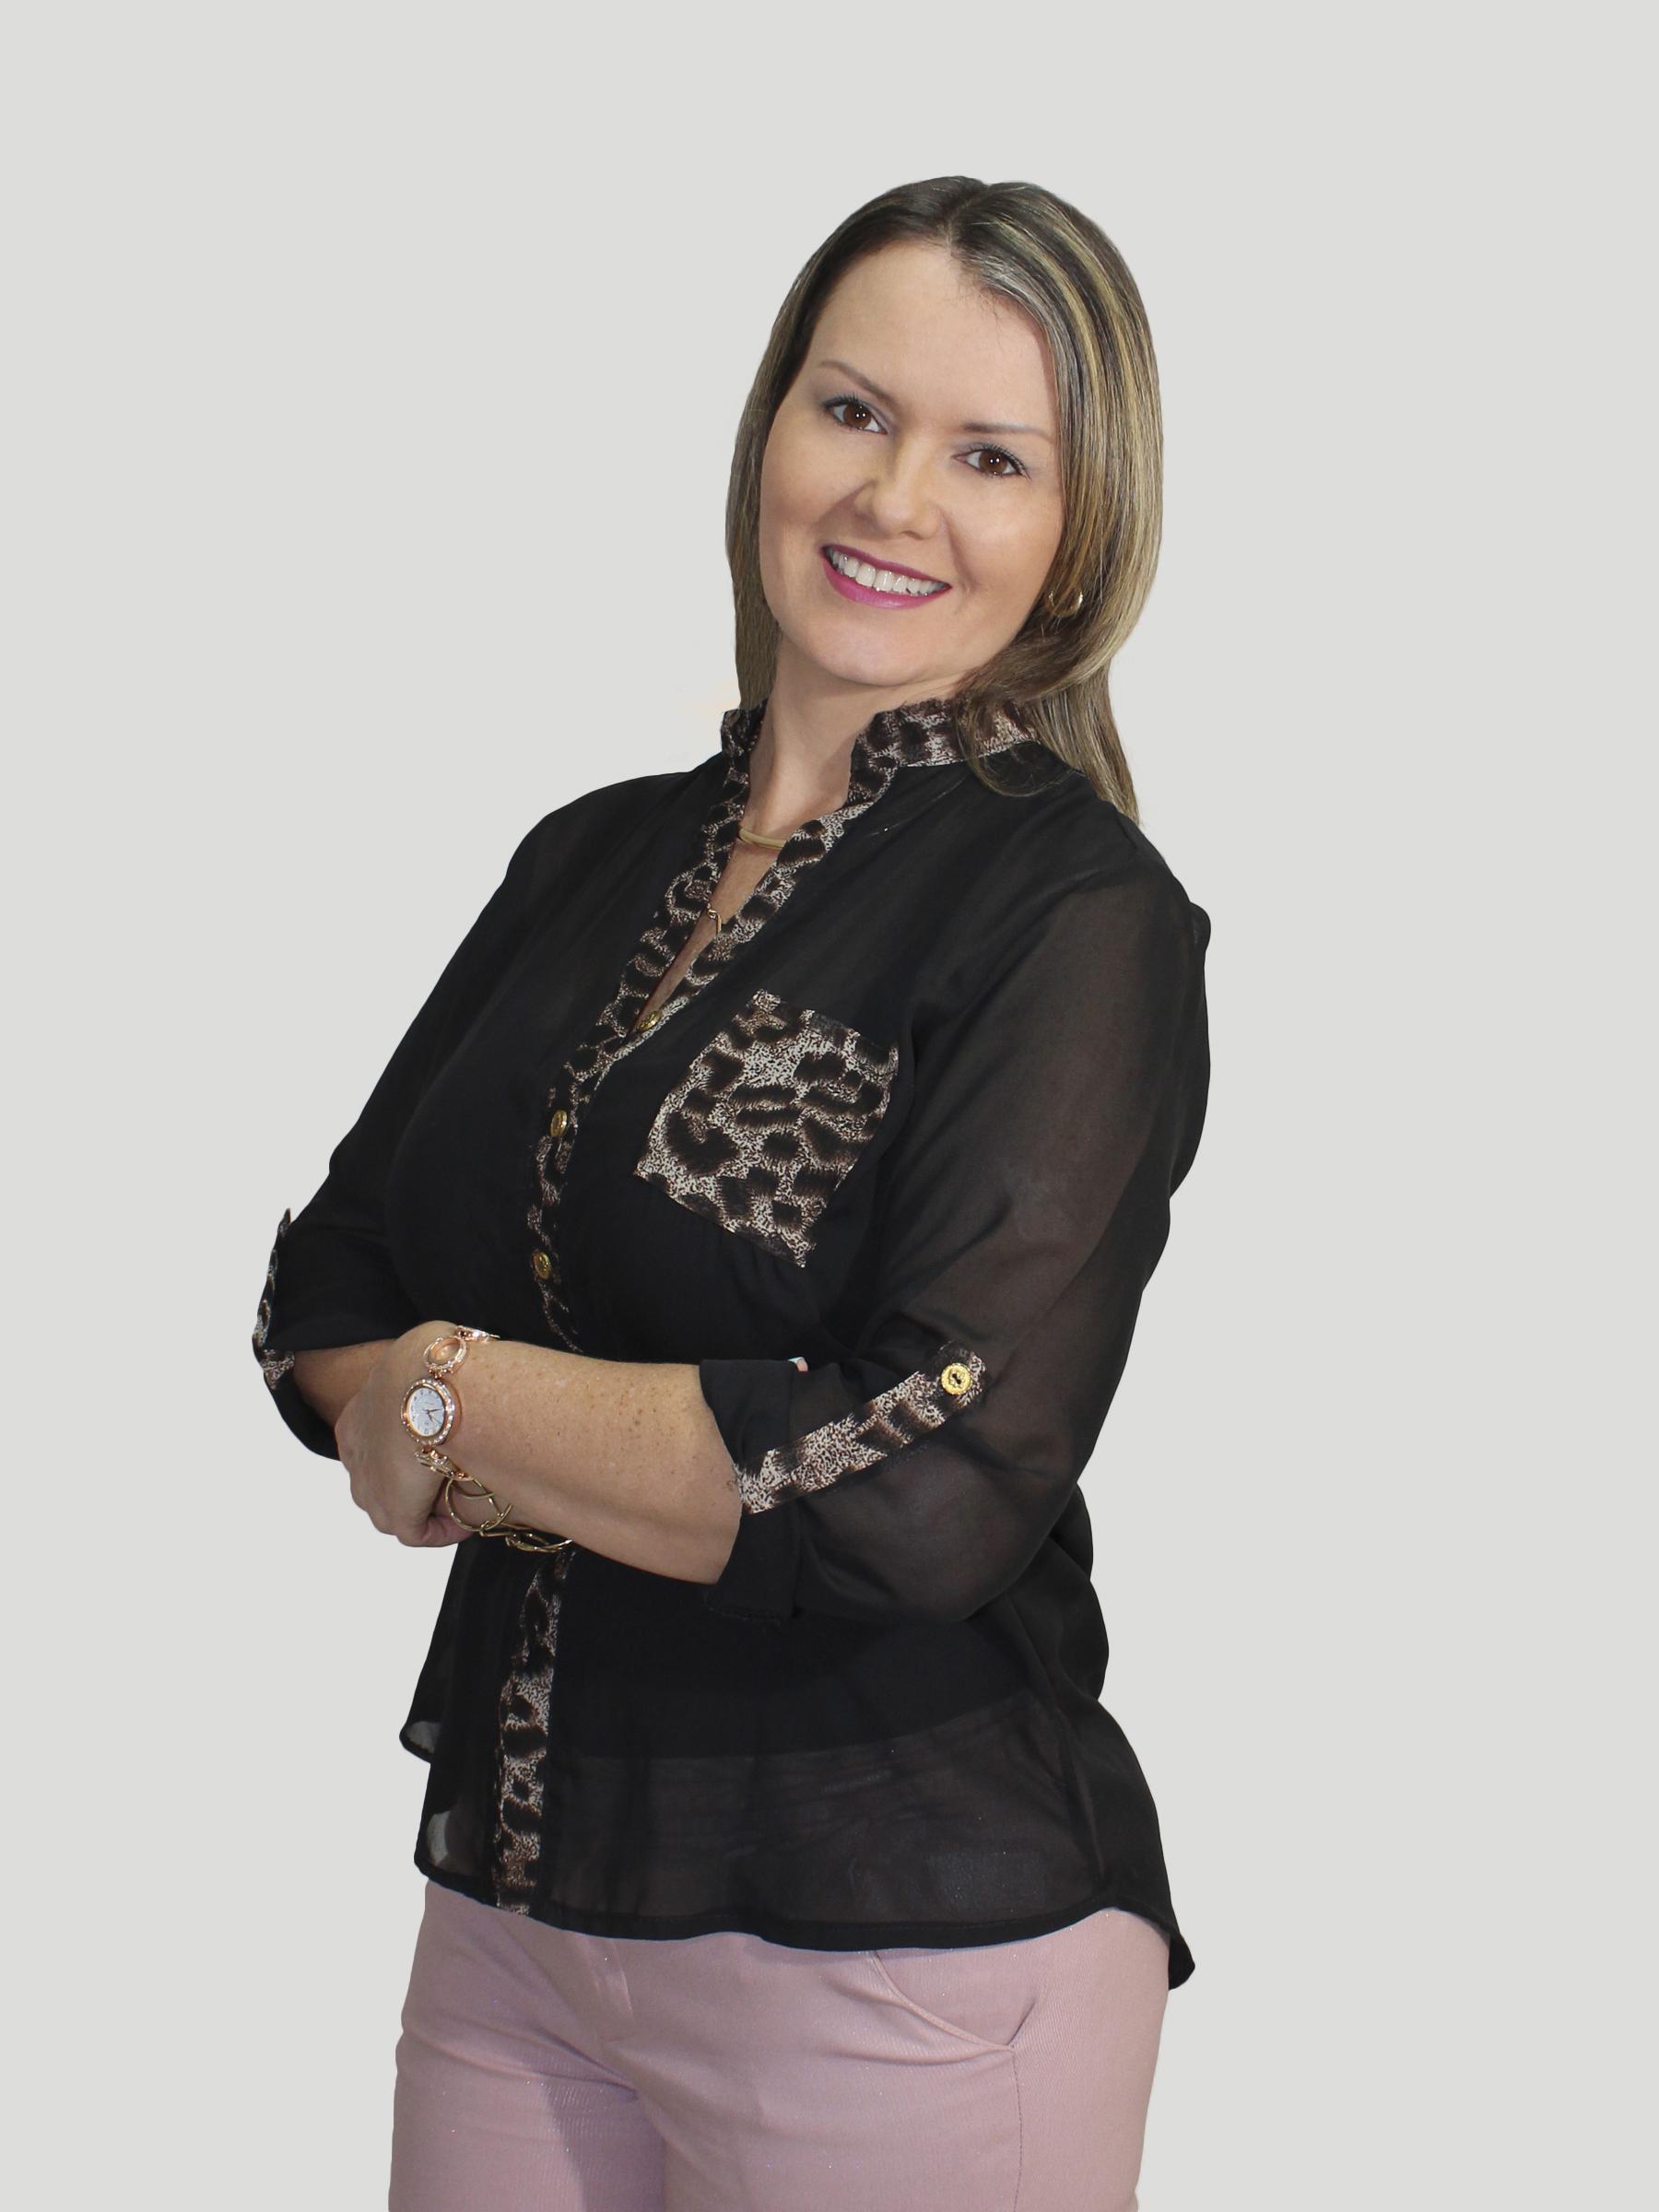 Raquel Pahissa Manteiga, coach AICM